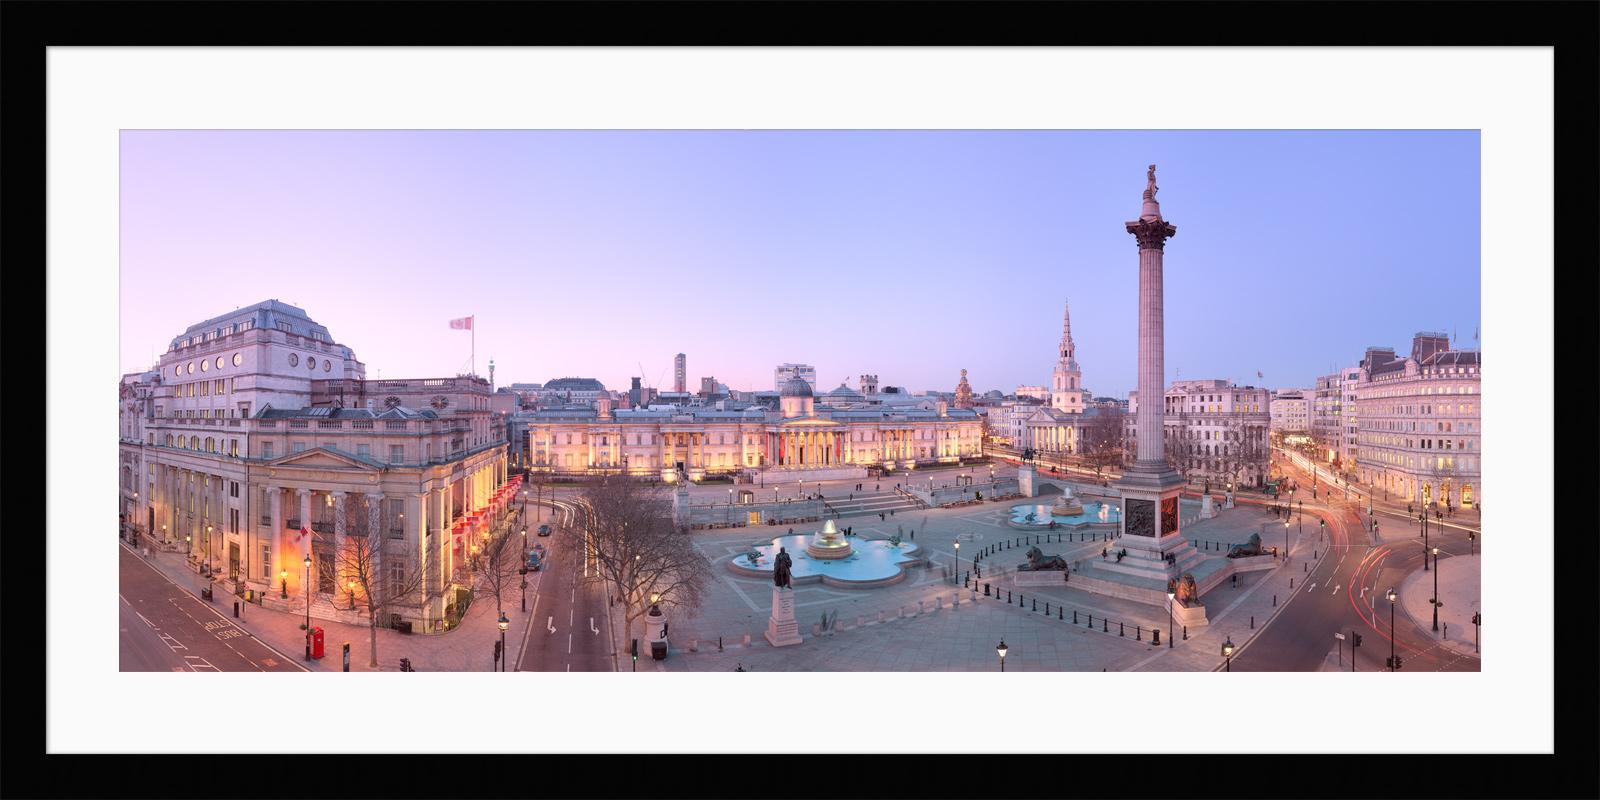 Trafalgar Square Twilight - Framed London Fine Art Photograph